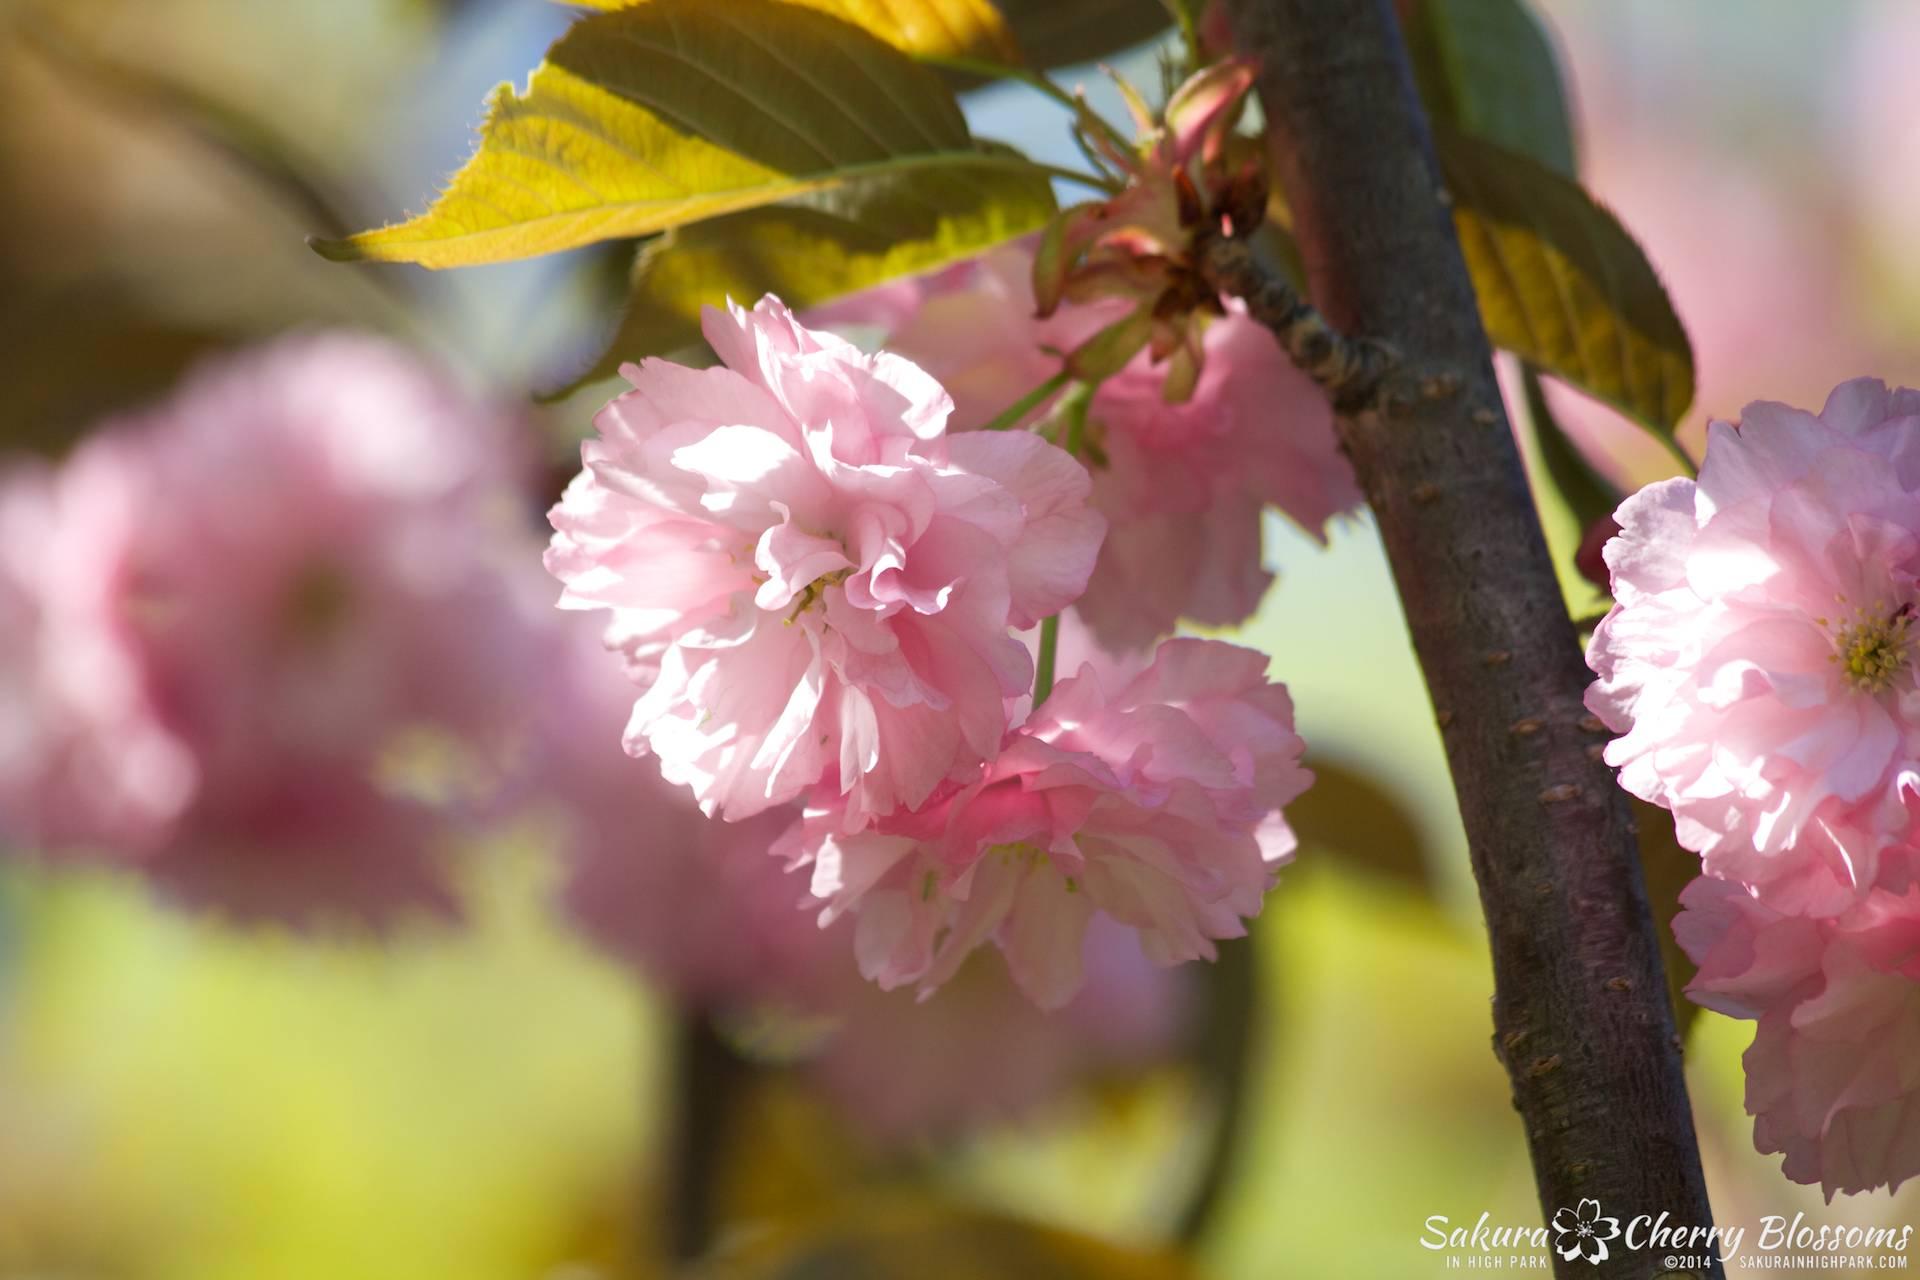 SakuraInHighPark-May2414-510.jpg